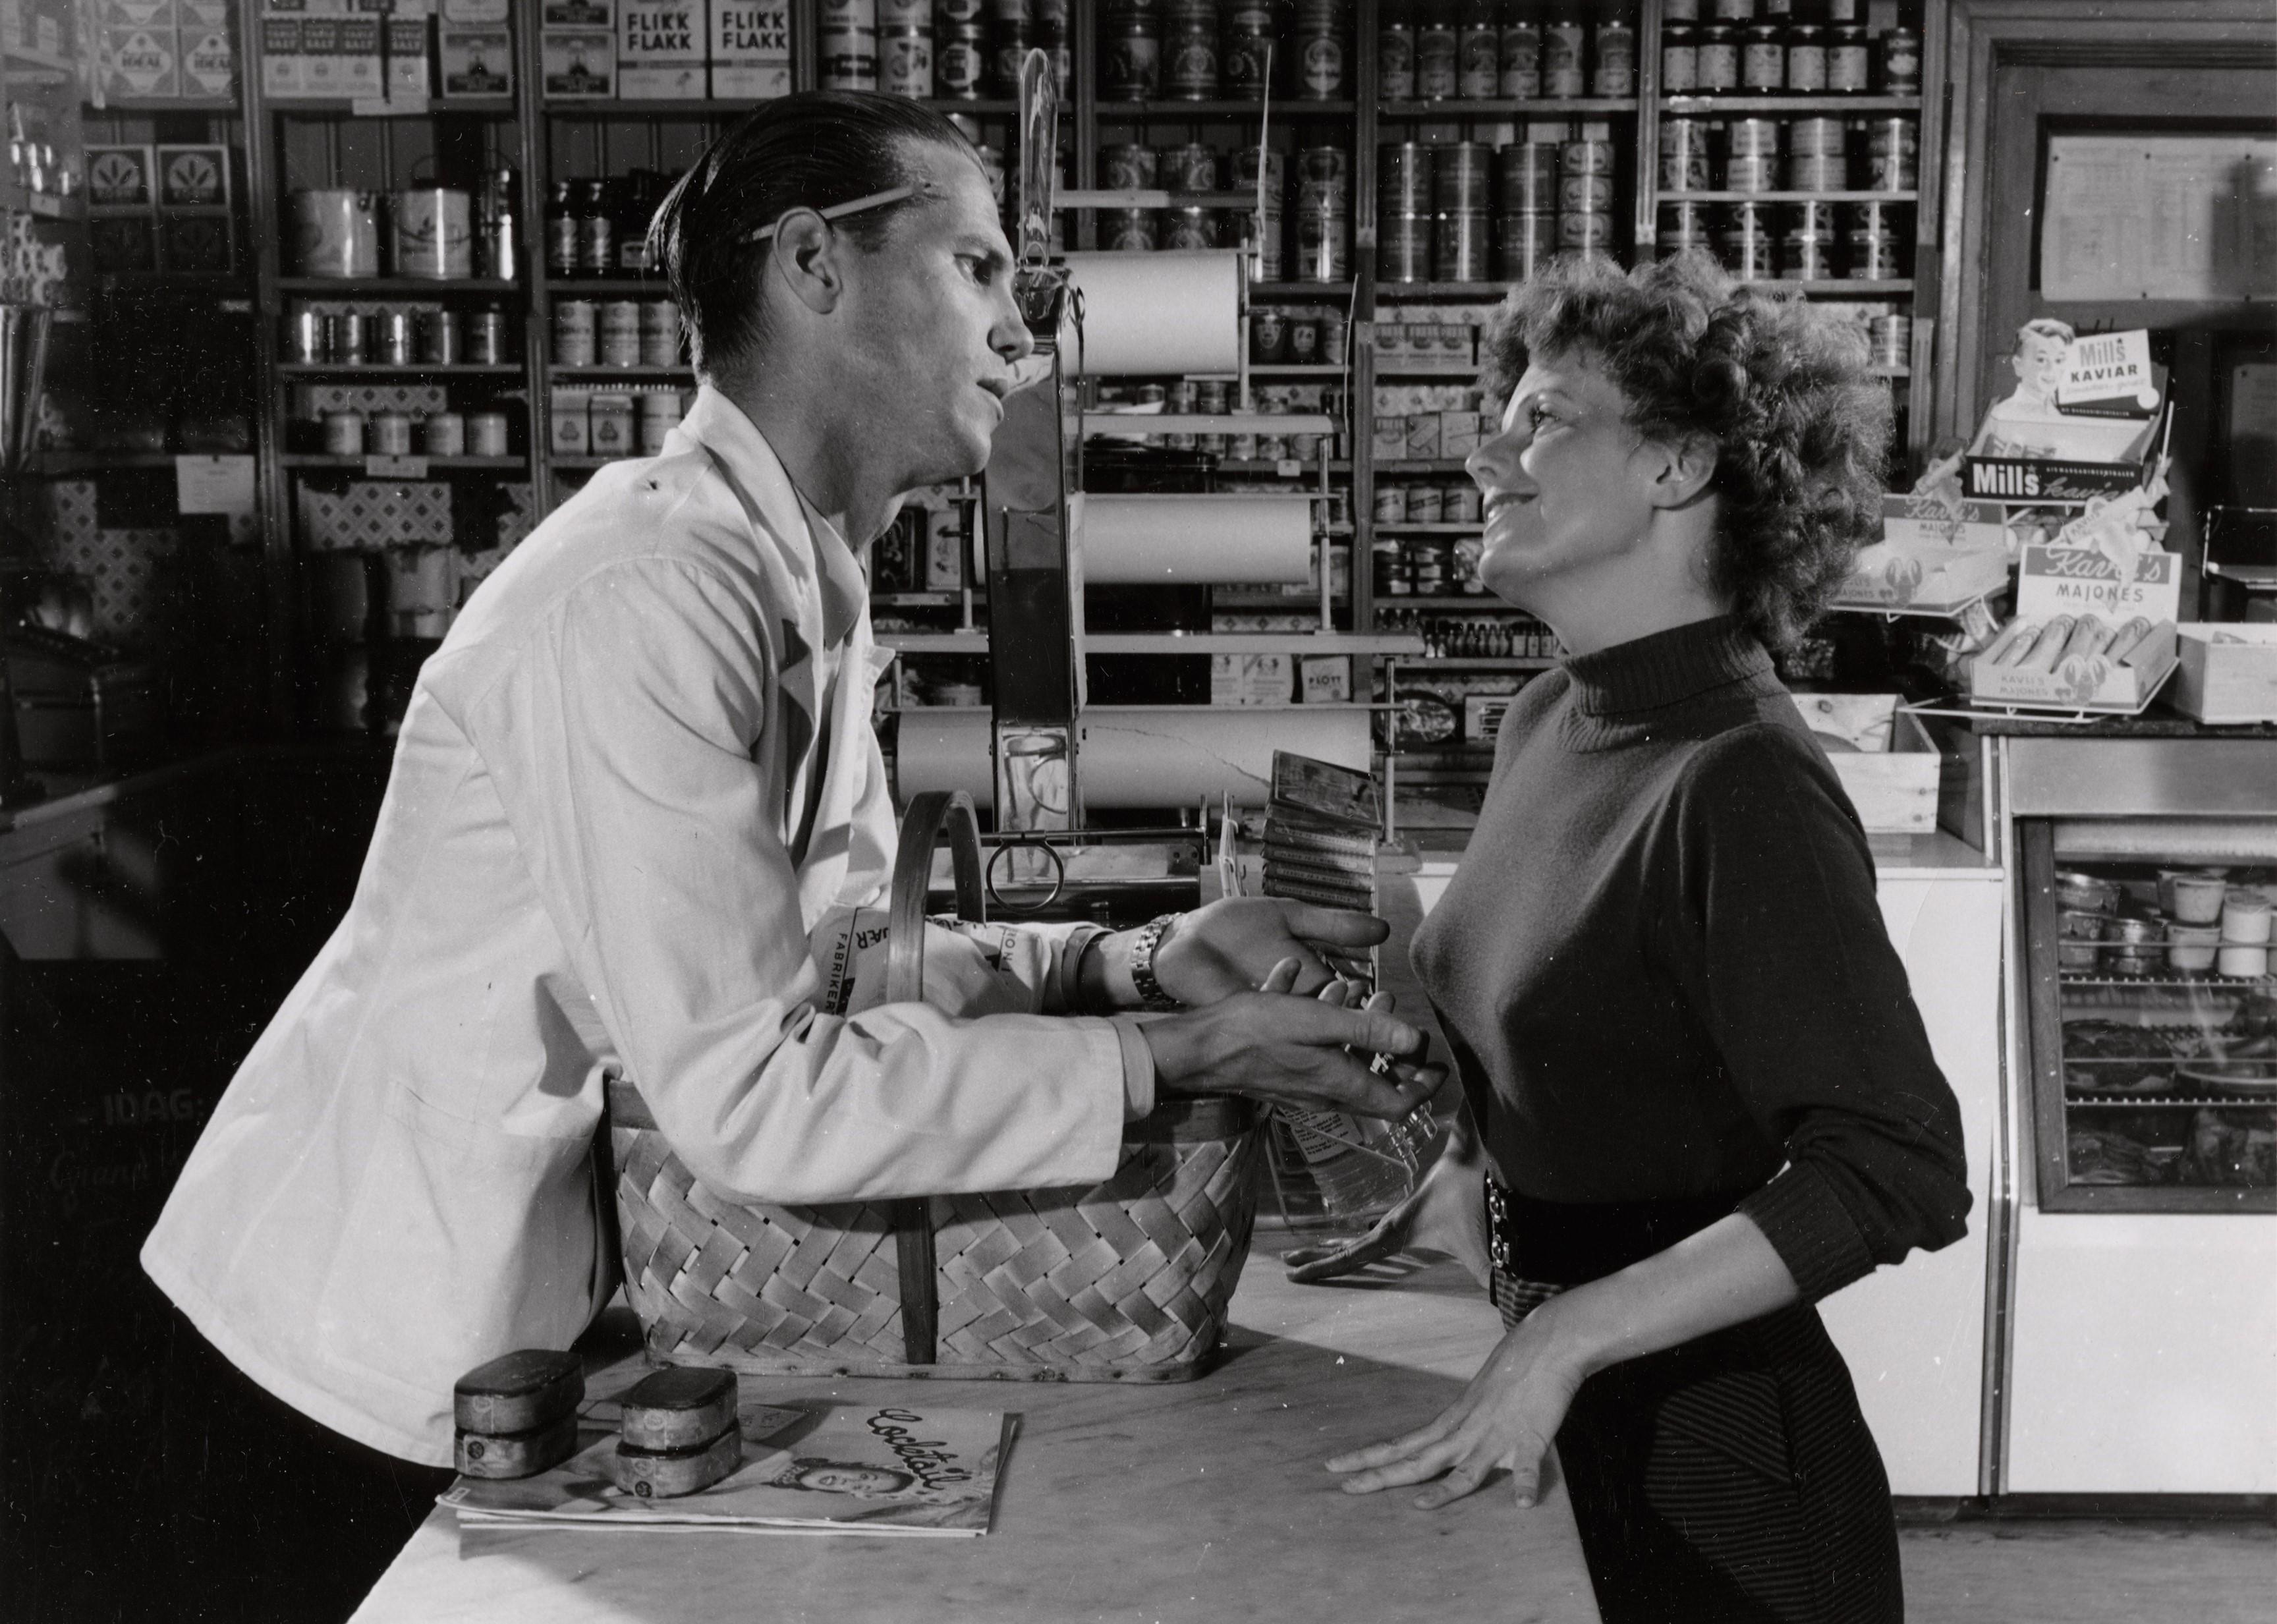 Grete Nordrå in Trost i taklampa (1955)